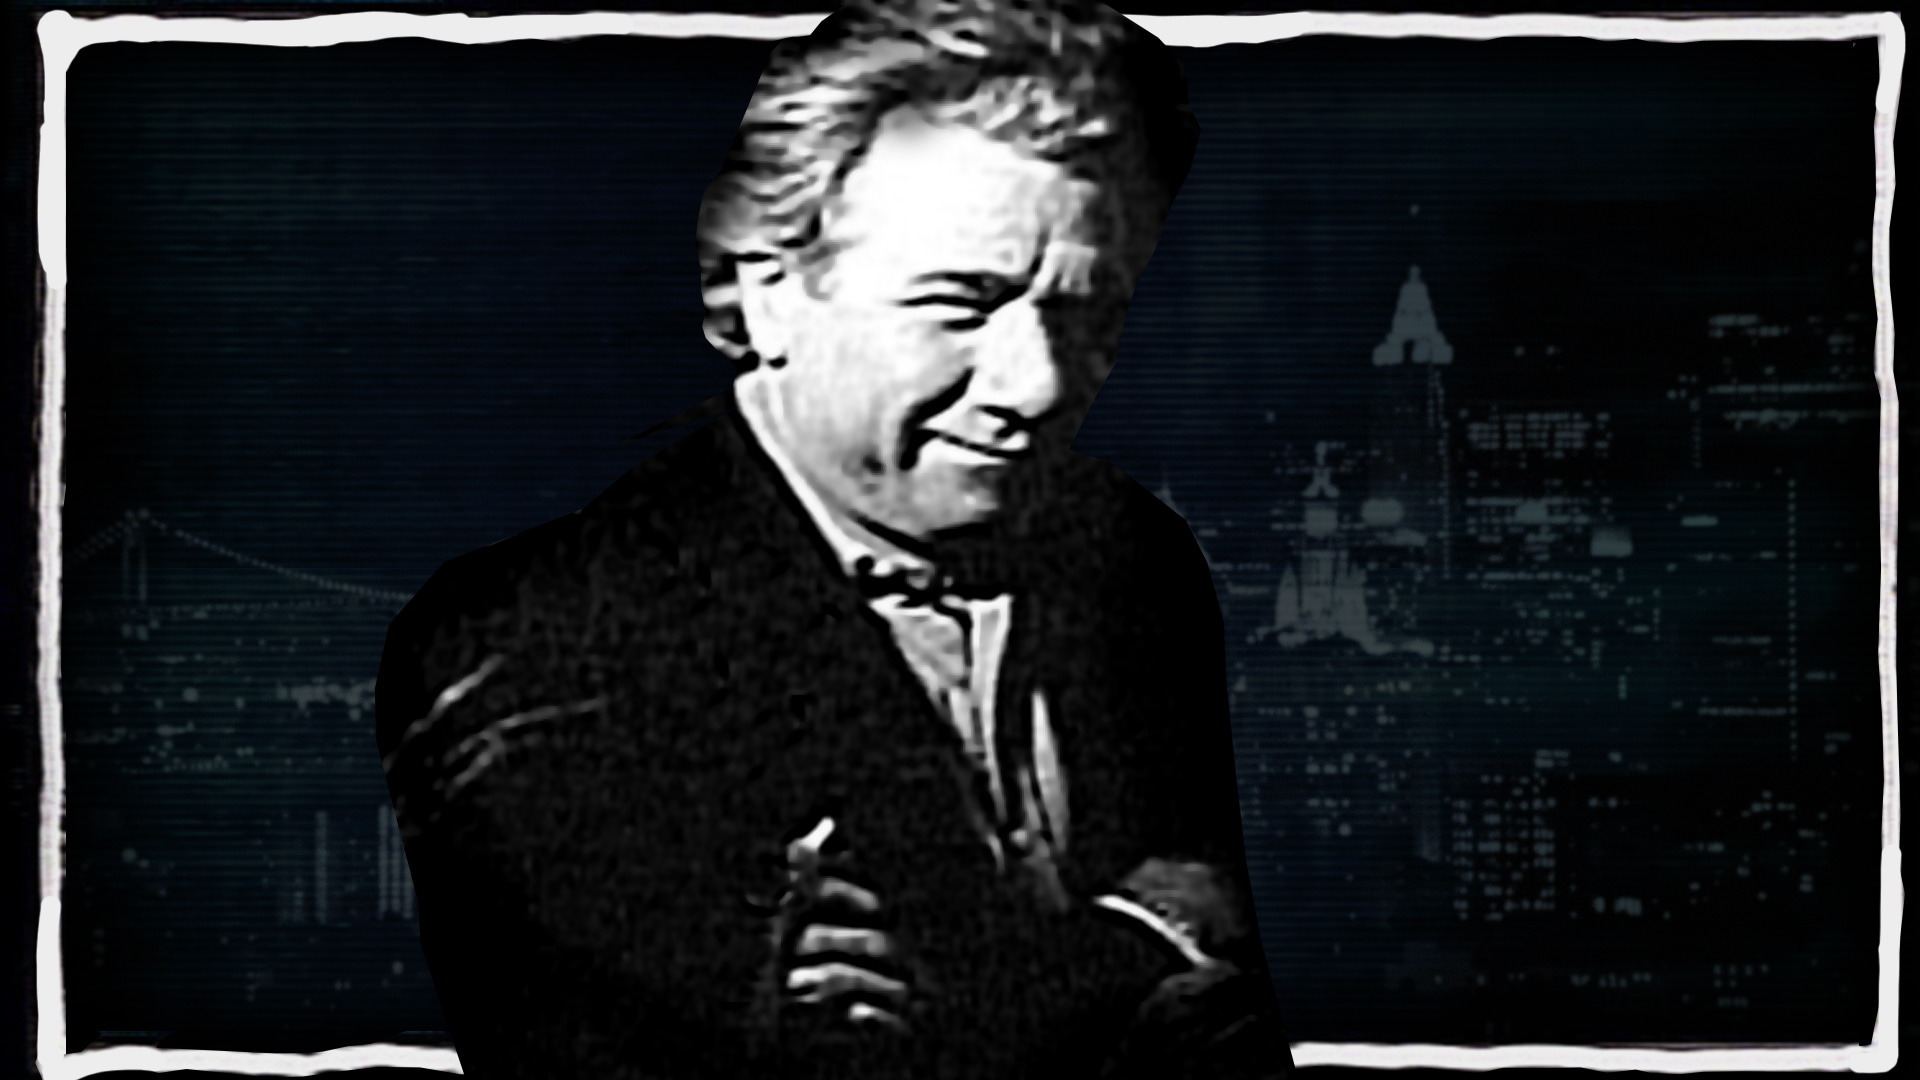 John Larroquette: October 22, 1988